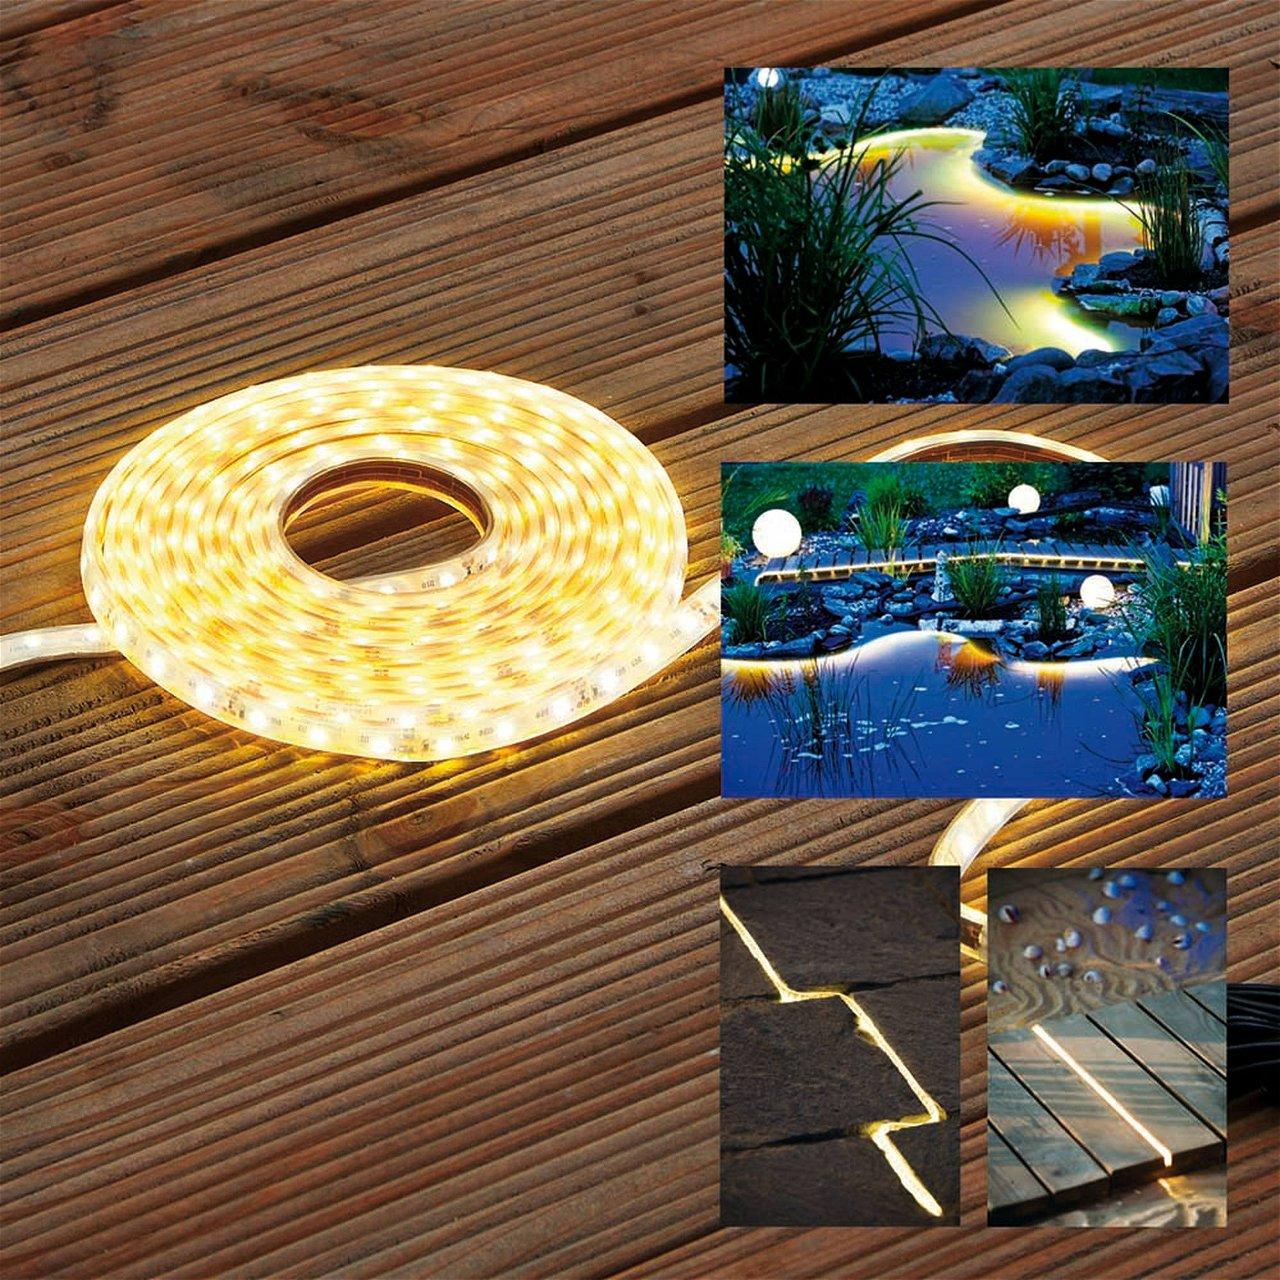 LED Strip Light, 12V, 60LEDs/m, IP 68